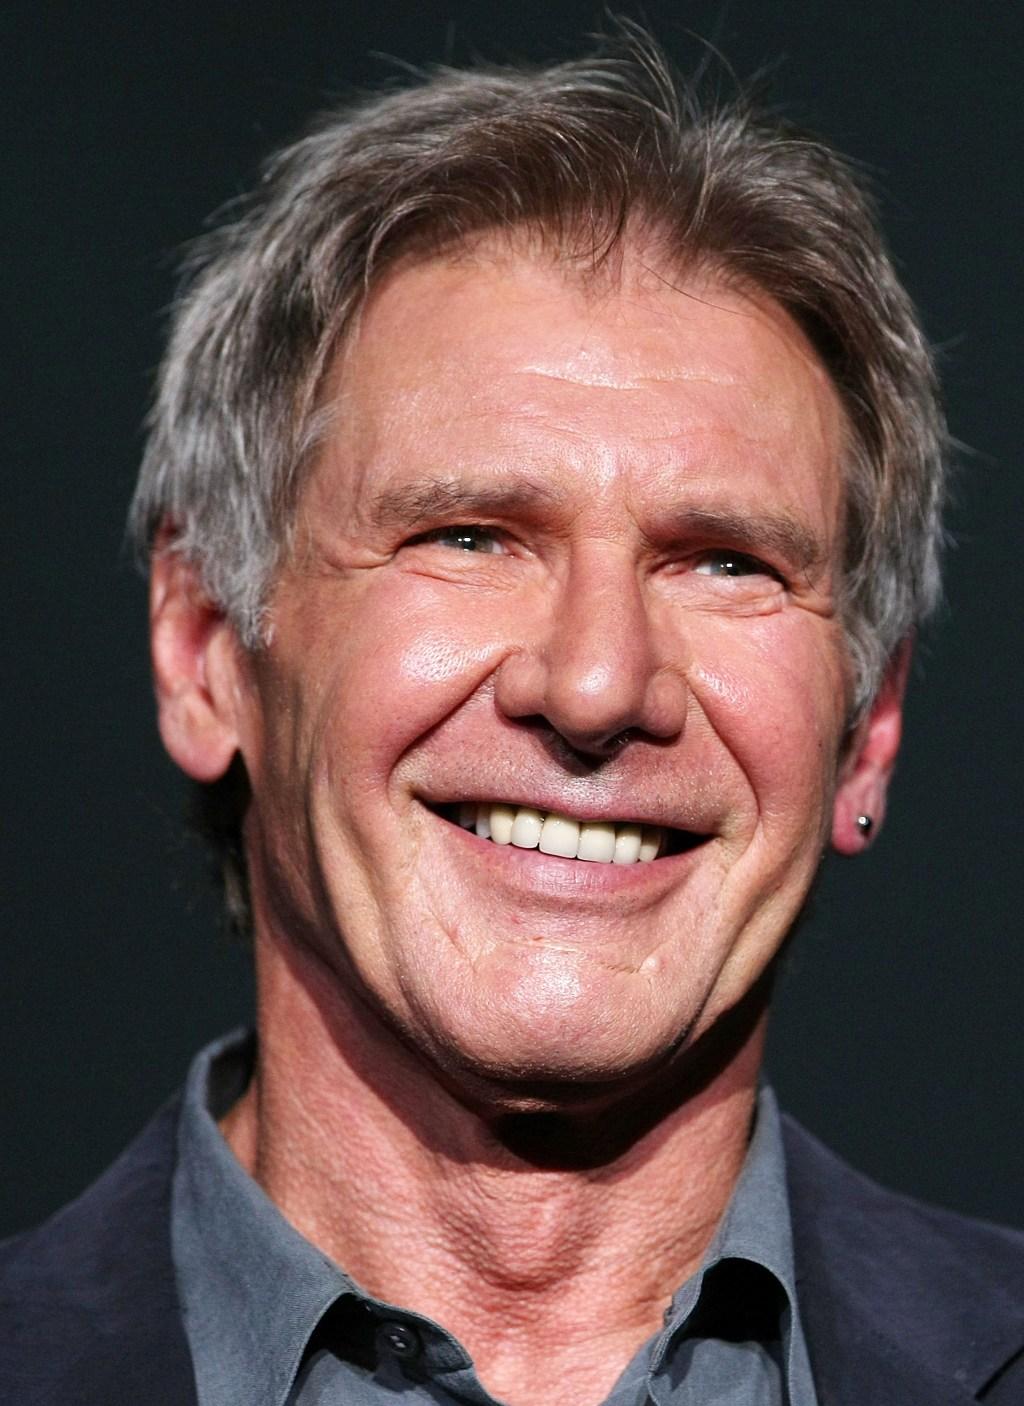 Harrison-Ford-Star-Wars-Episode-7-leg-injury Harrison Ford Star Wars Episode 7 injury